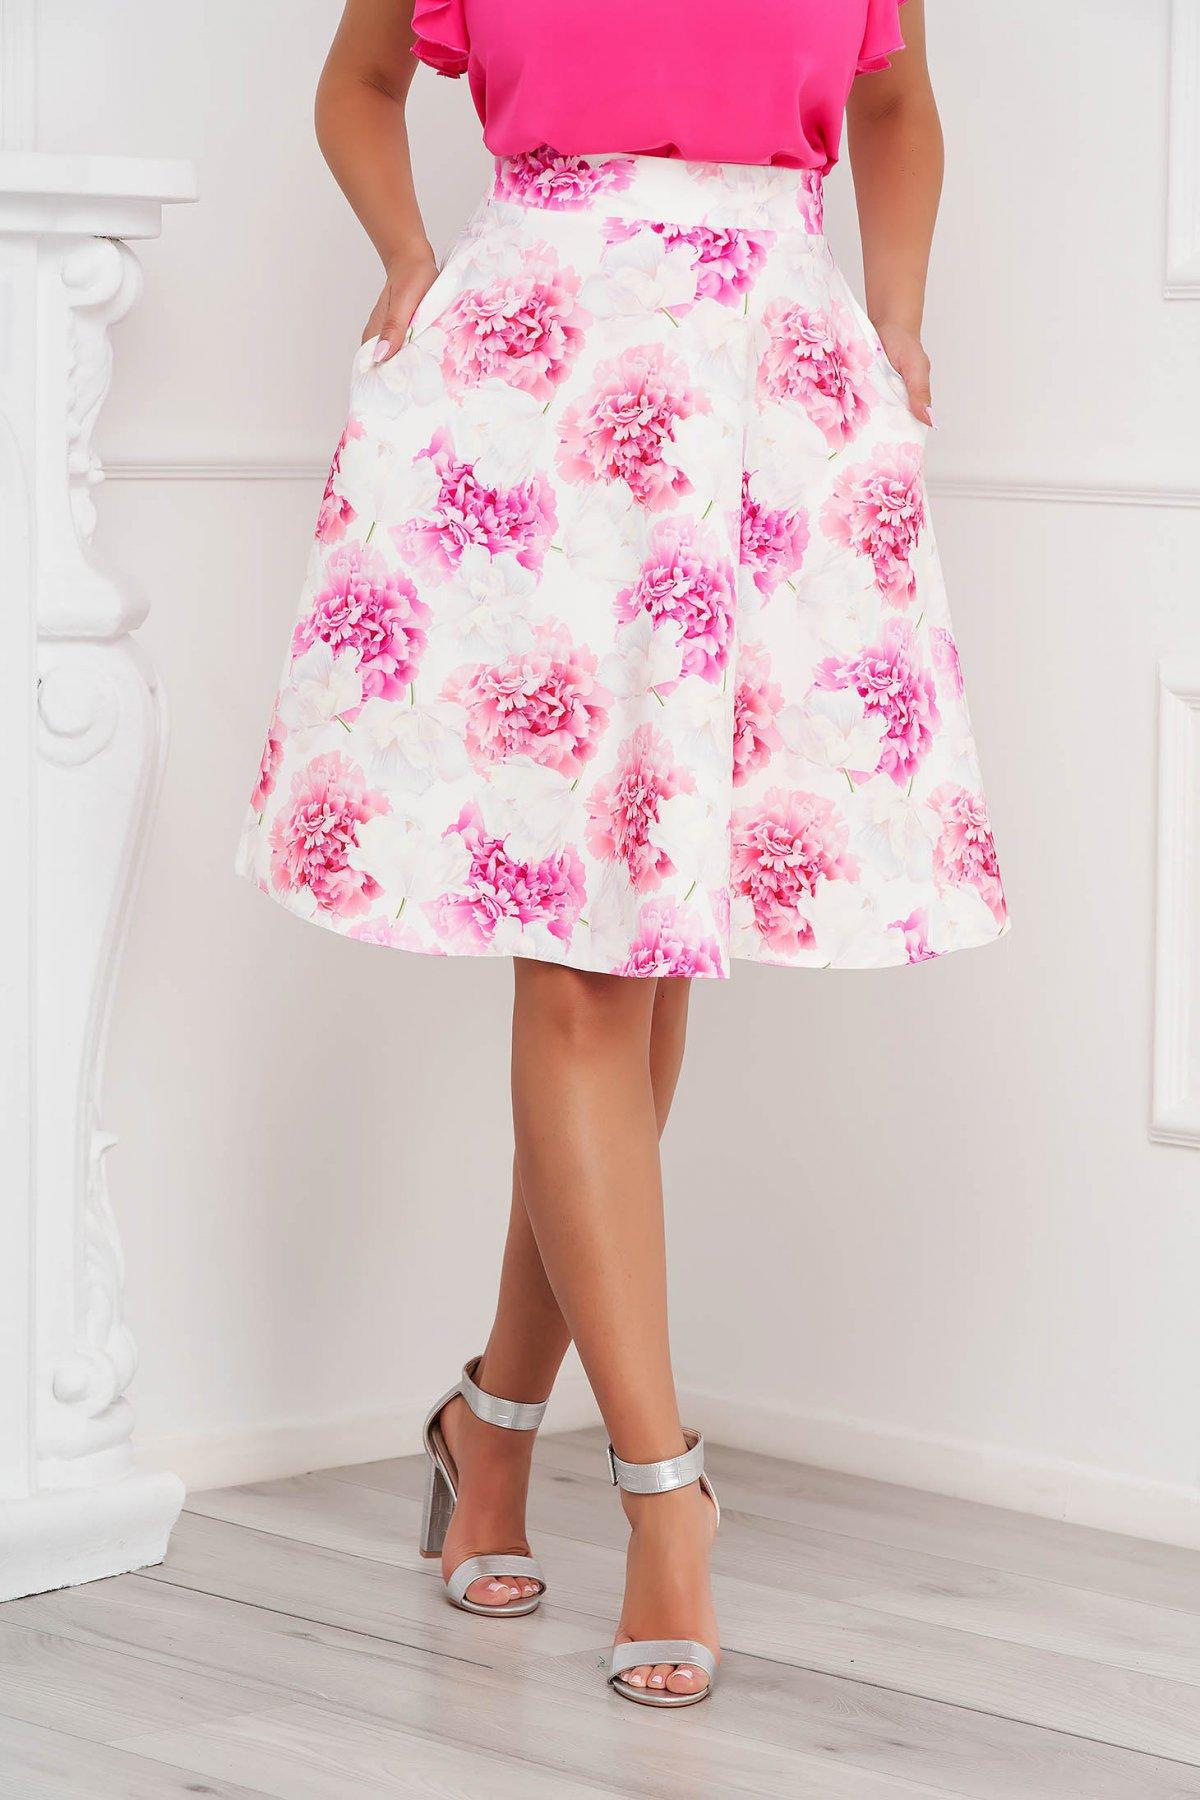 Fusta StarShinerS roz deschis eleganta in clos din material subtire cu imprimeu floral unic